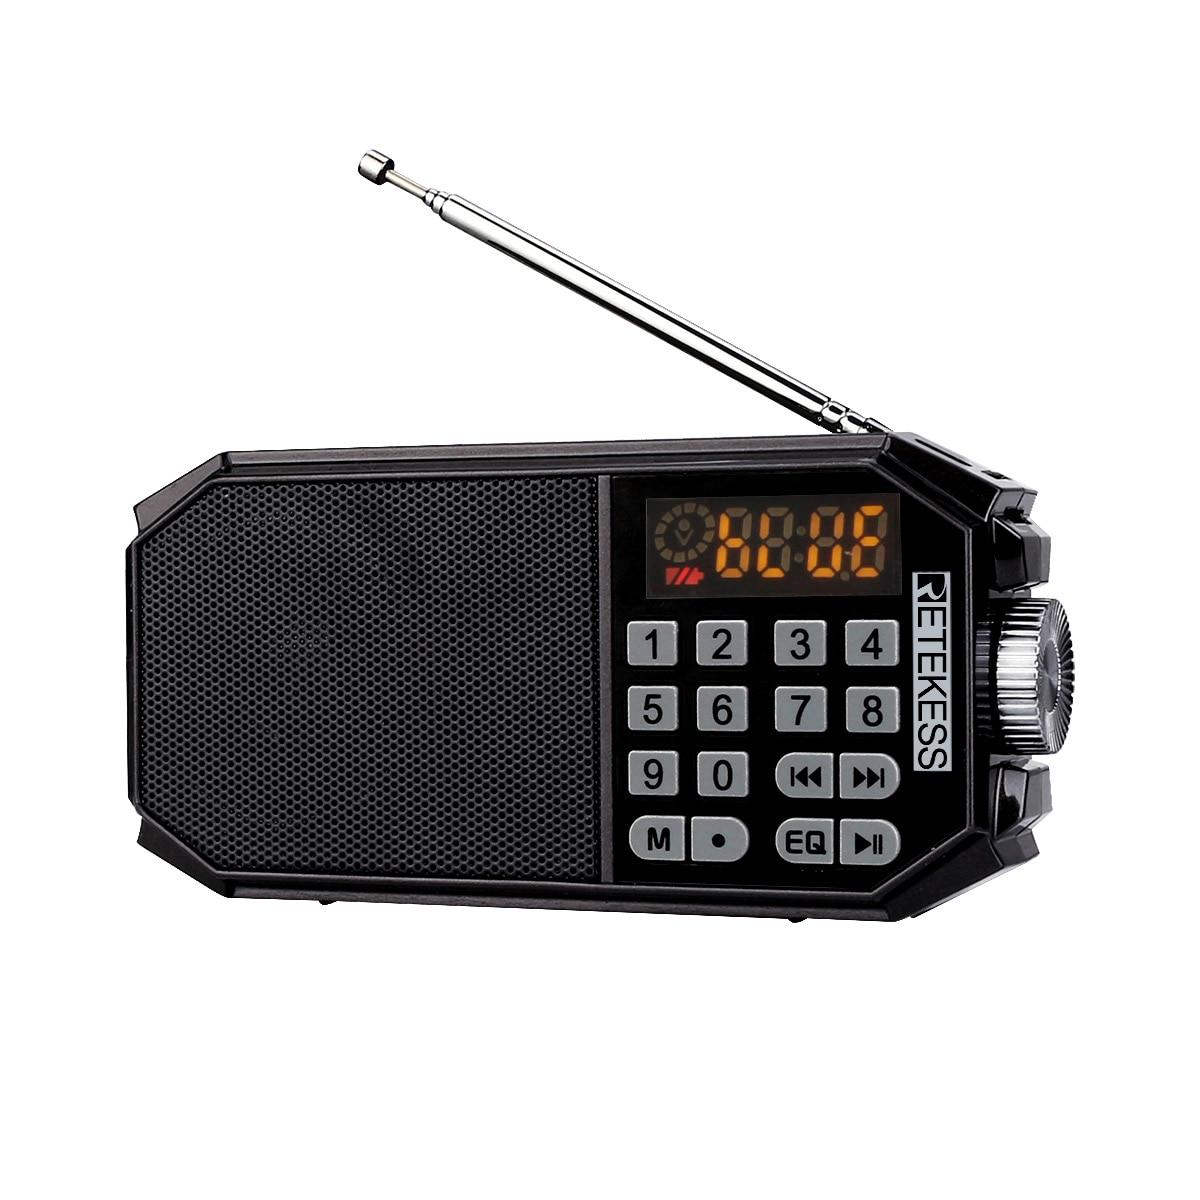 RETEKESS TR610 FM Radio bluetooth reproductor de música bluetooth llamadas u-disk TF tarjeta de grabación LED pantalla Digital integrado EQ